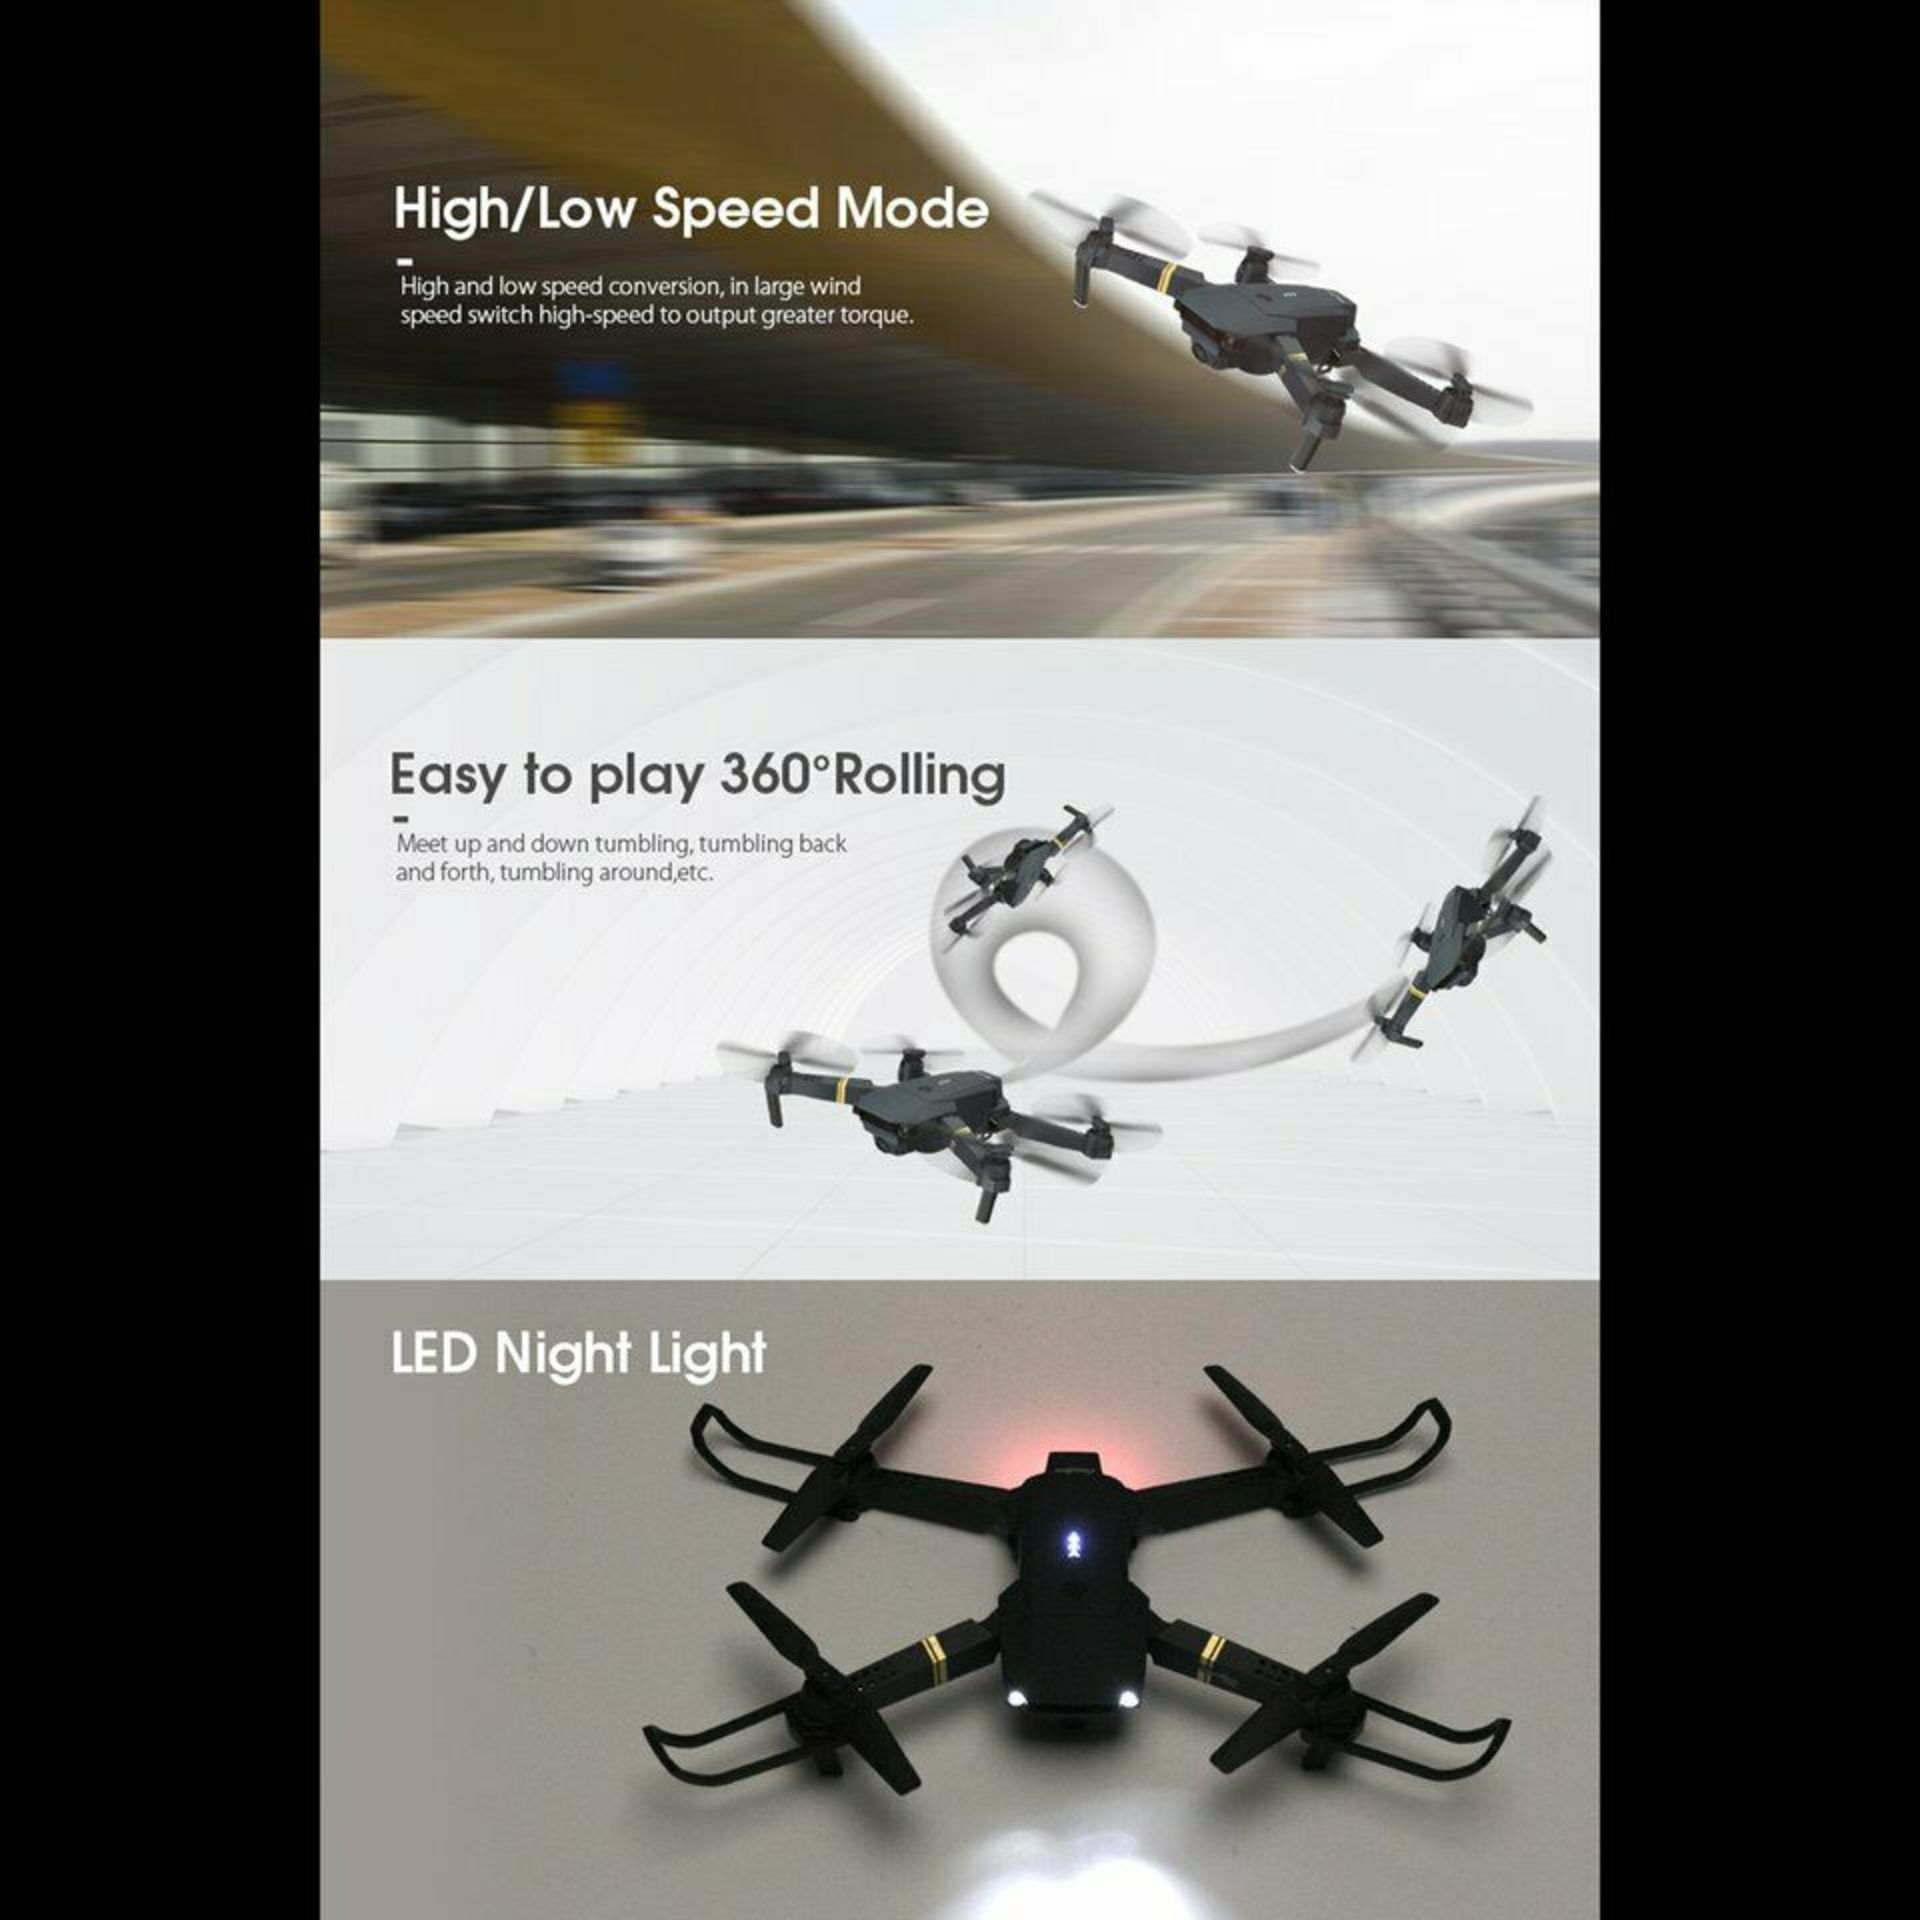 NEW & UNUSED DRONE X PRO WIFI FPV 1080P HD CAMERA FOLDABLE RC QUADCOPTER + BAG *PLUS VAT* - Image 7 of 12